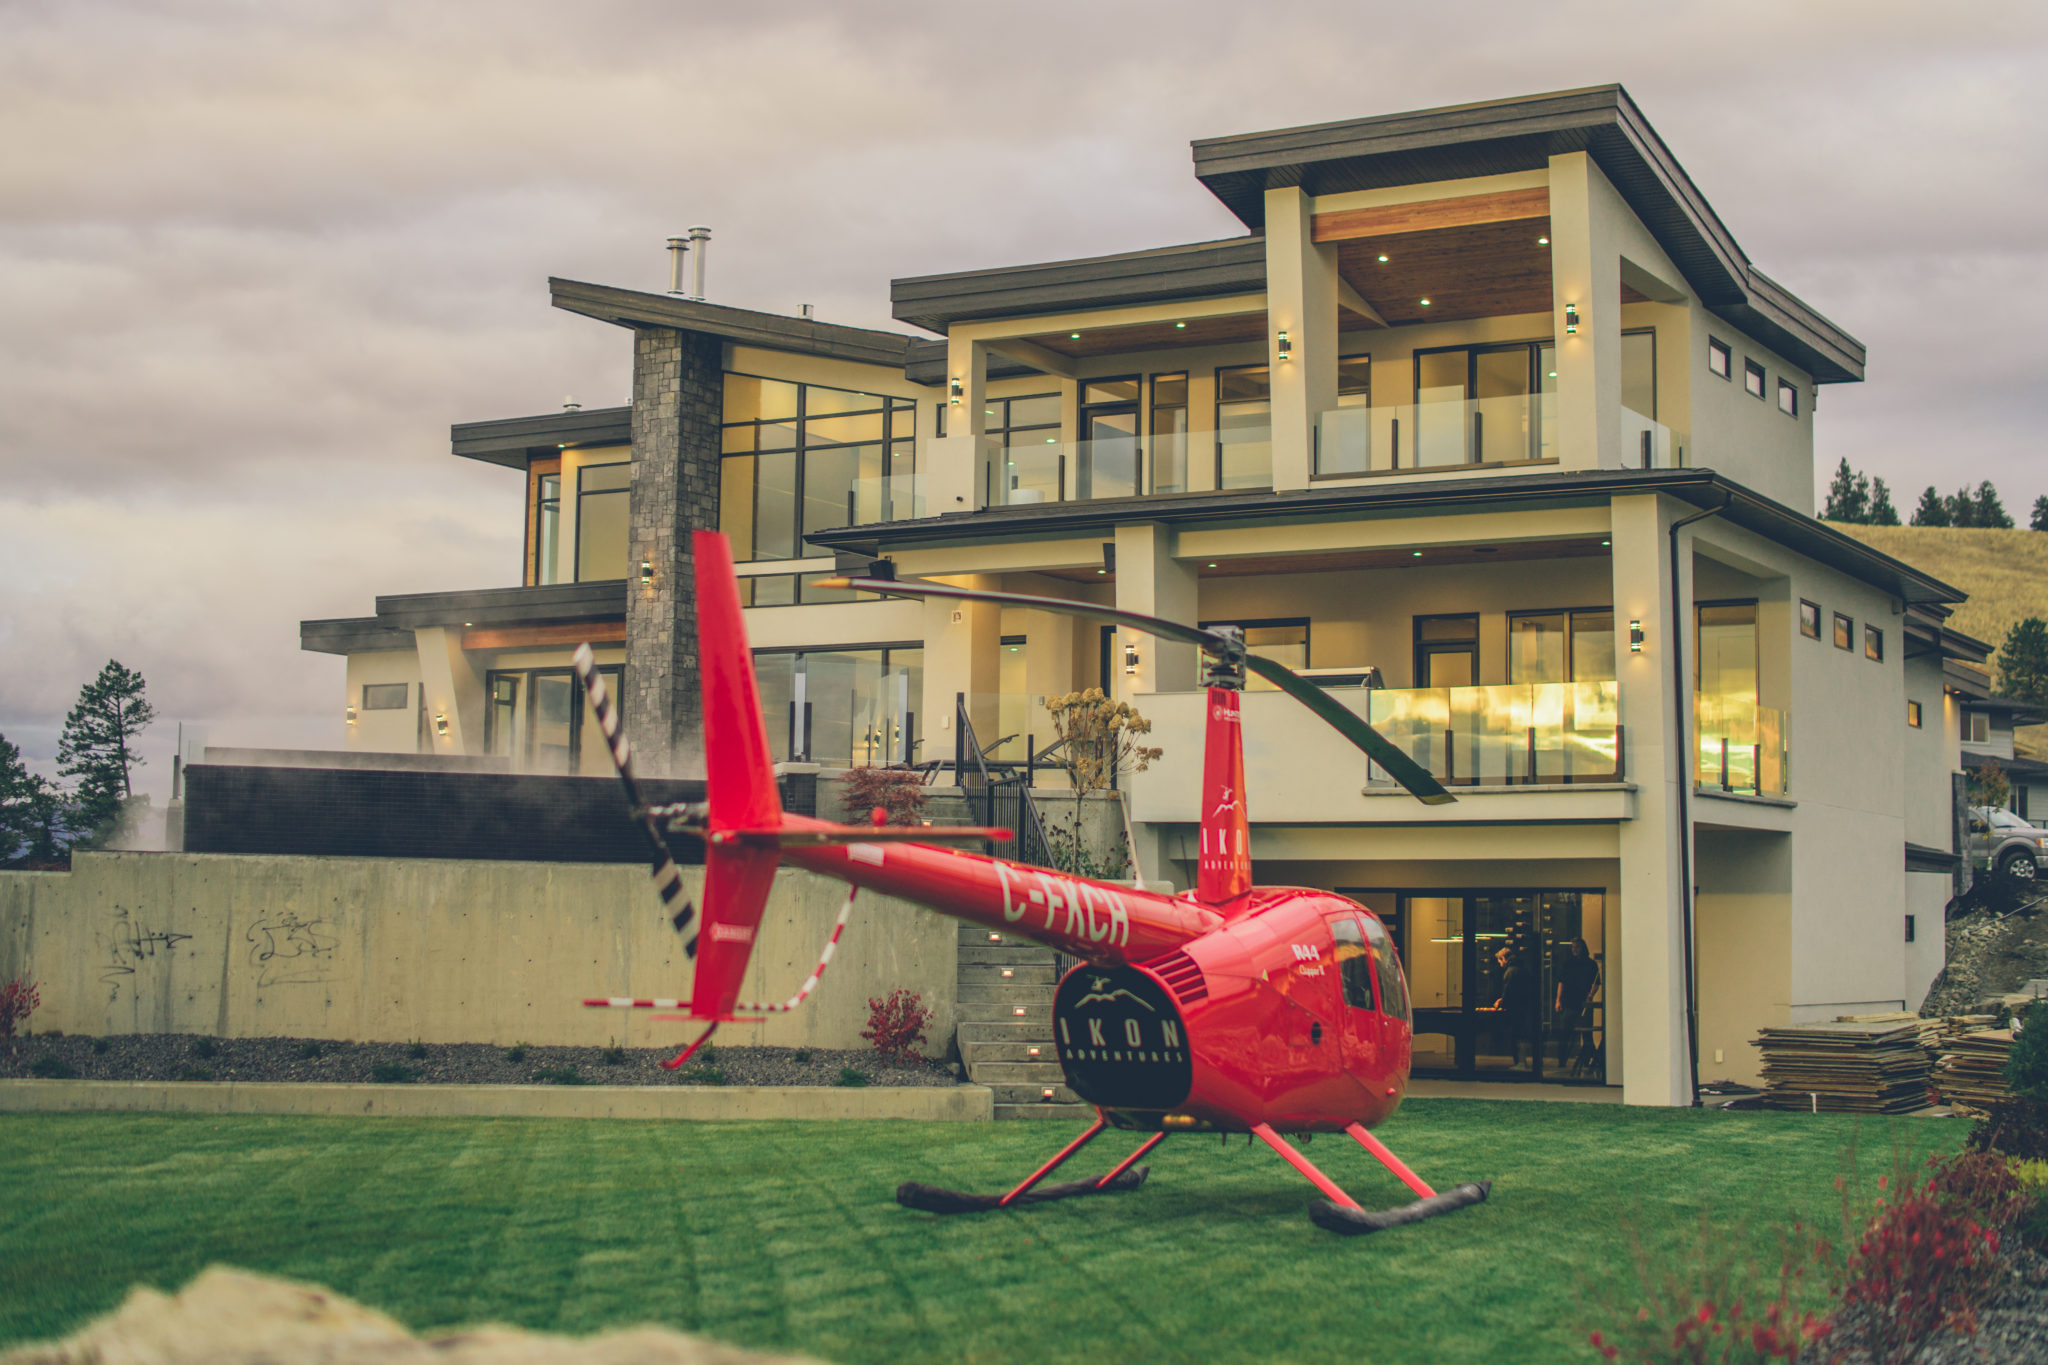 Helicopter Services - Okangan BC | Ikon Adventures